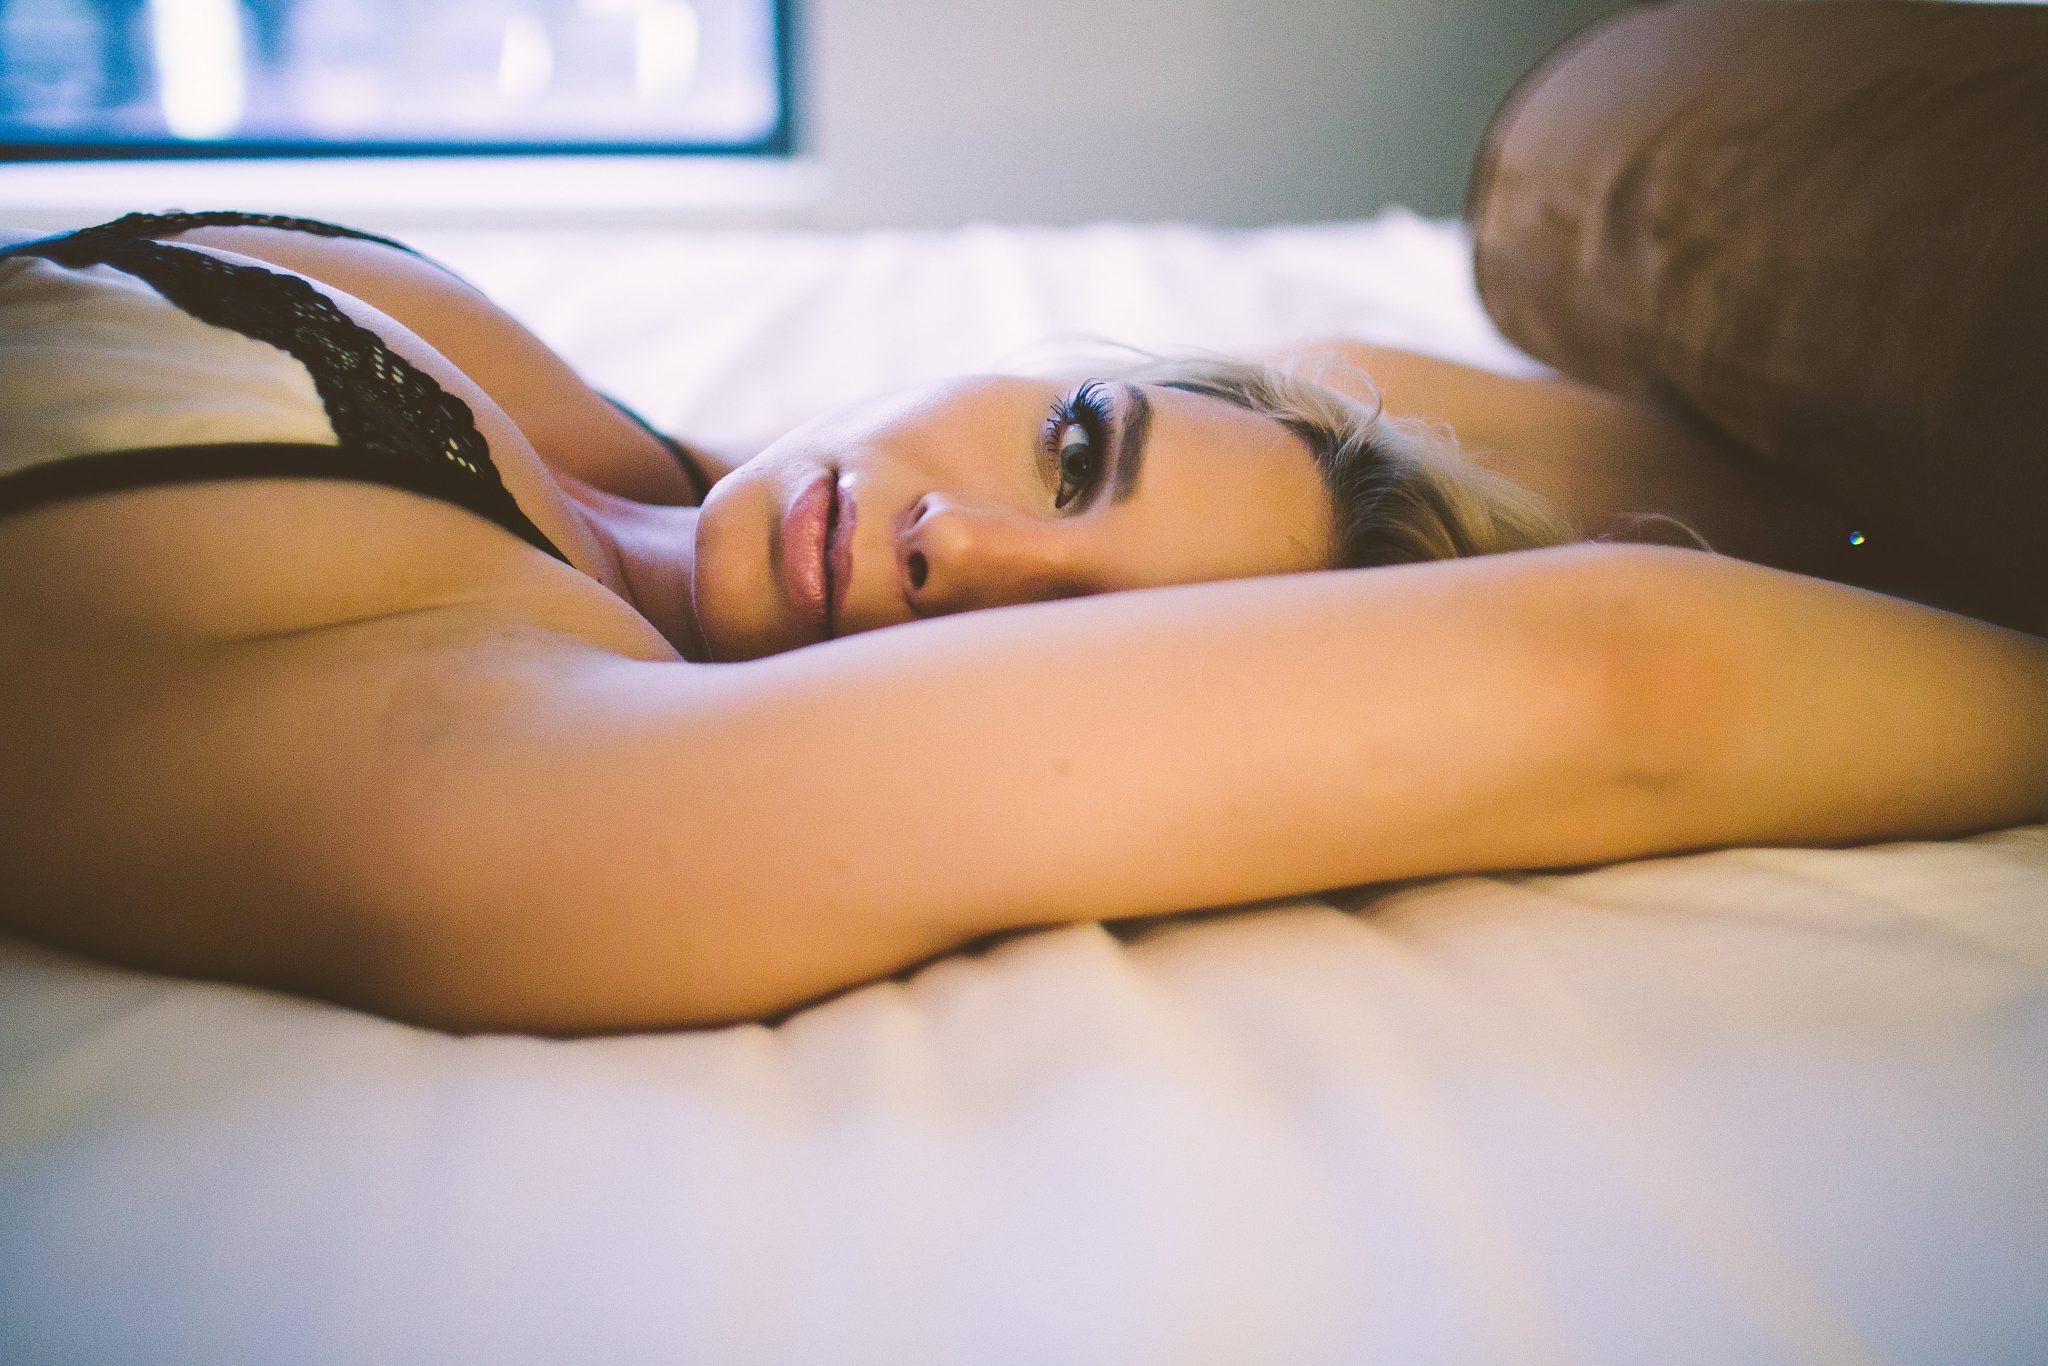 Taking boudoir photos for a bachelorette party